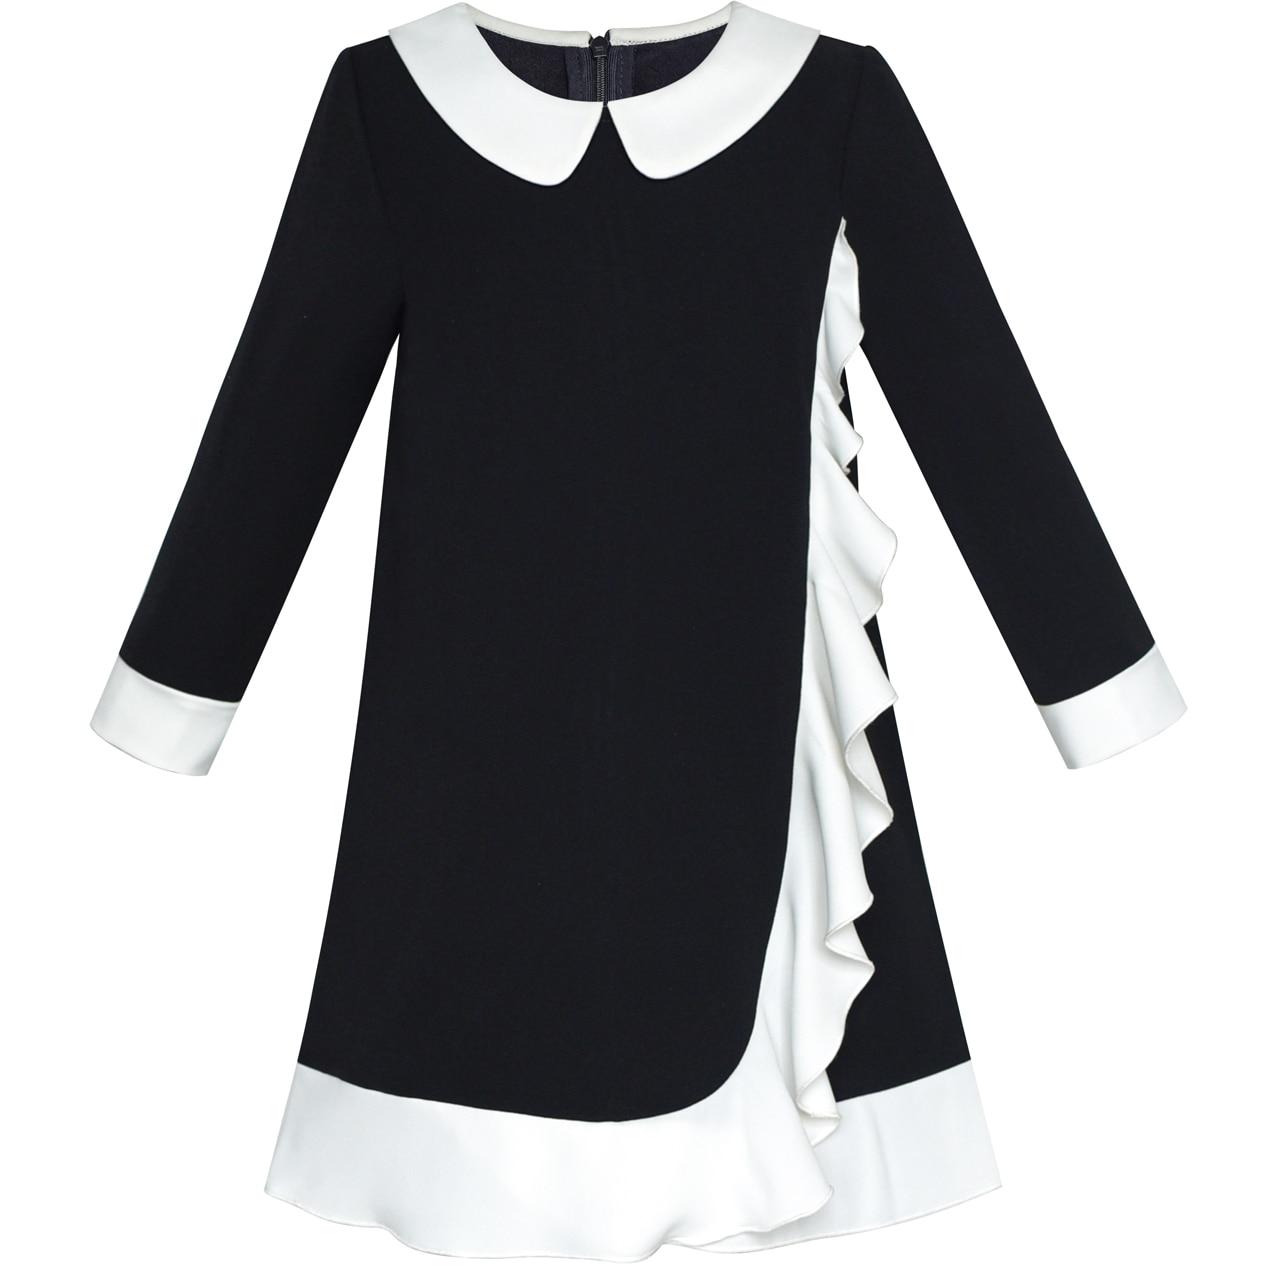 Sunny Fashion Vestidos niña Armada Negro Manga larga Uniforme escolar 2020 El verano Princesa Boda Partido Vestidos Ropa de niños Pompa Sundress